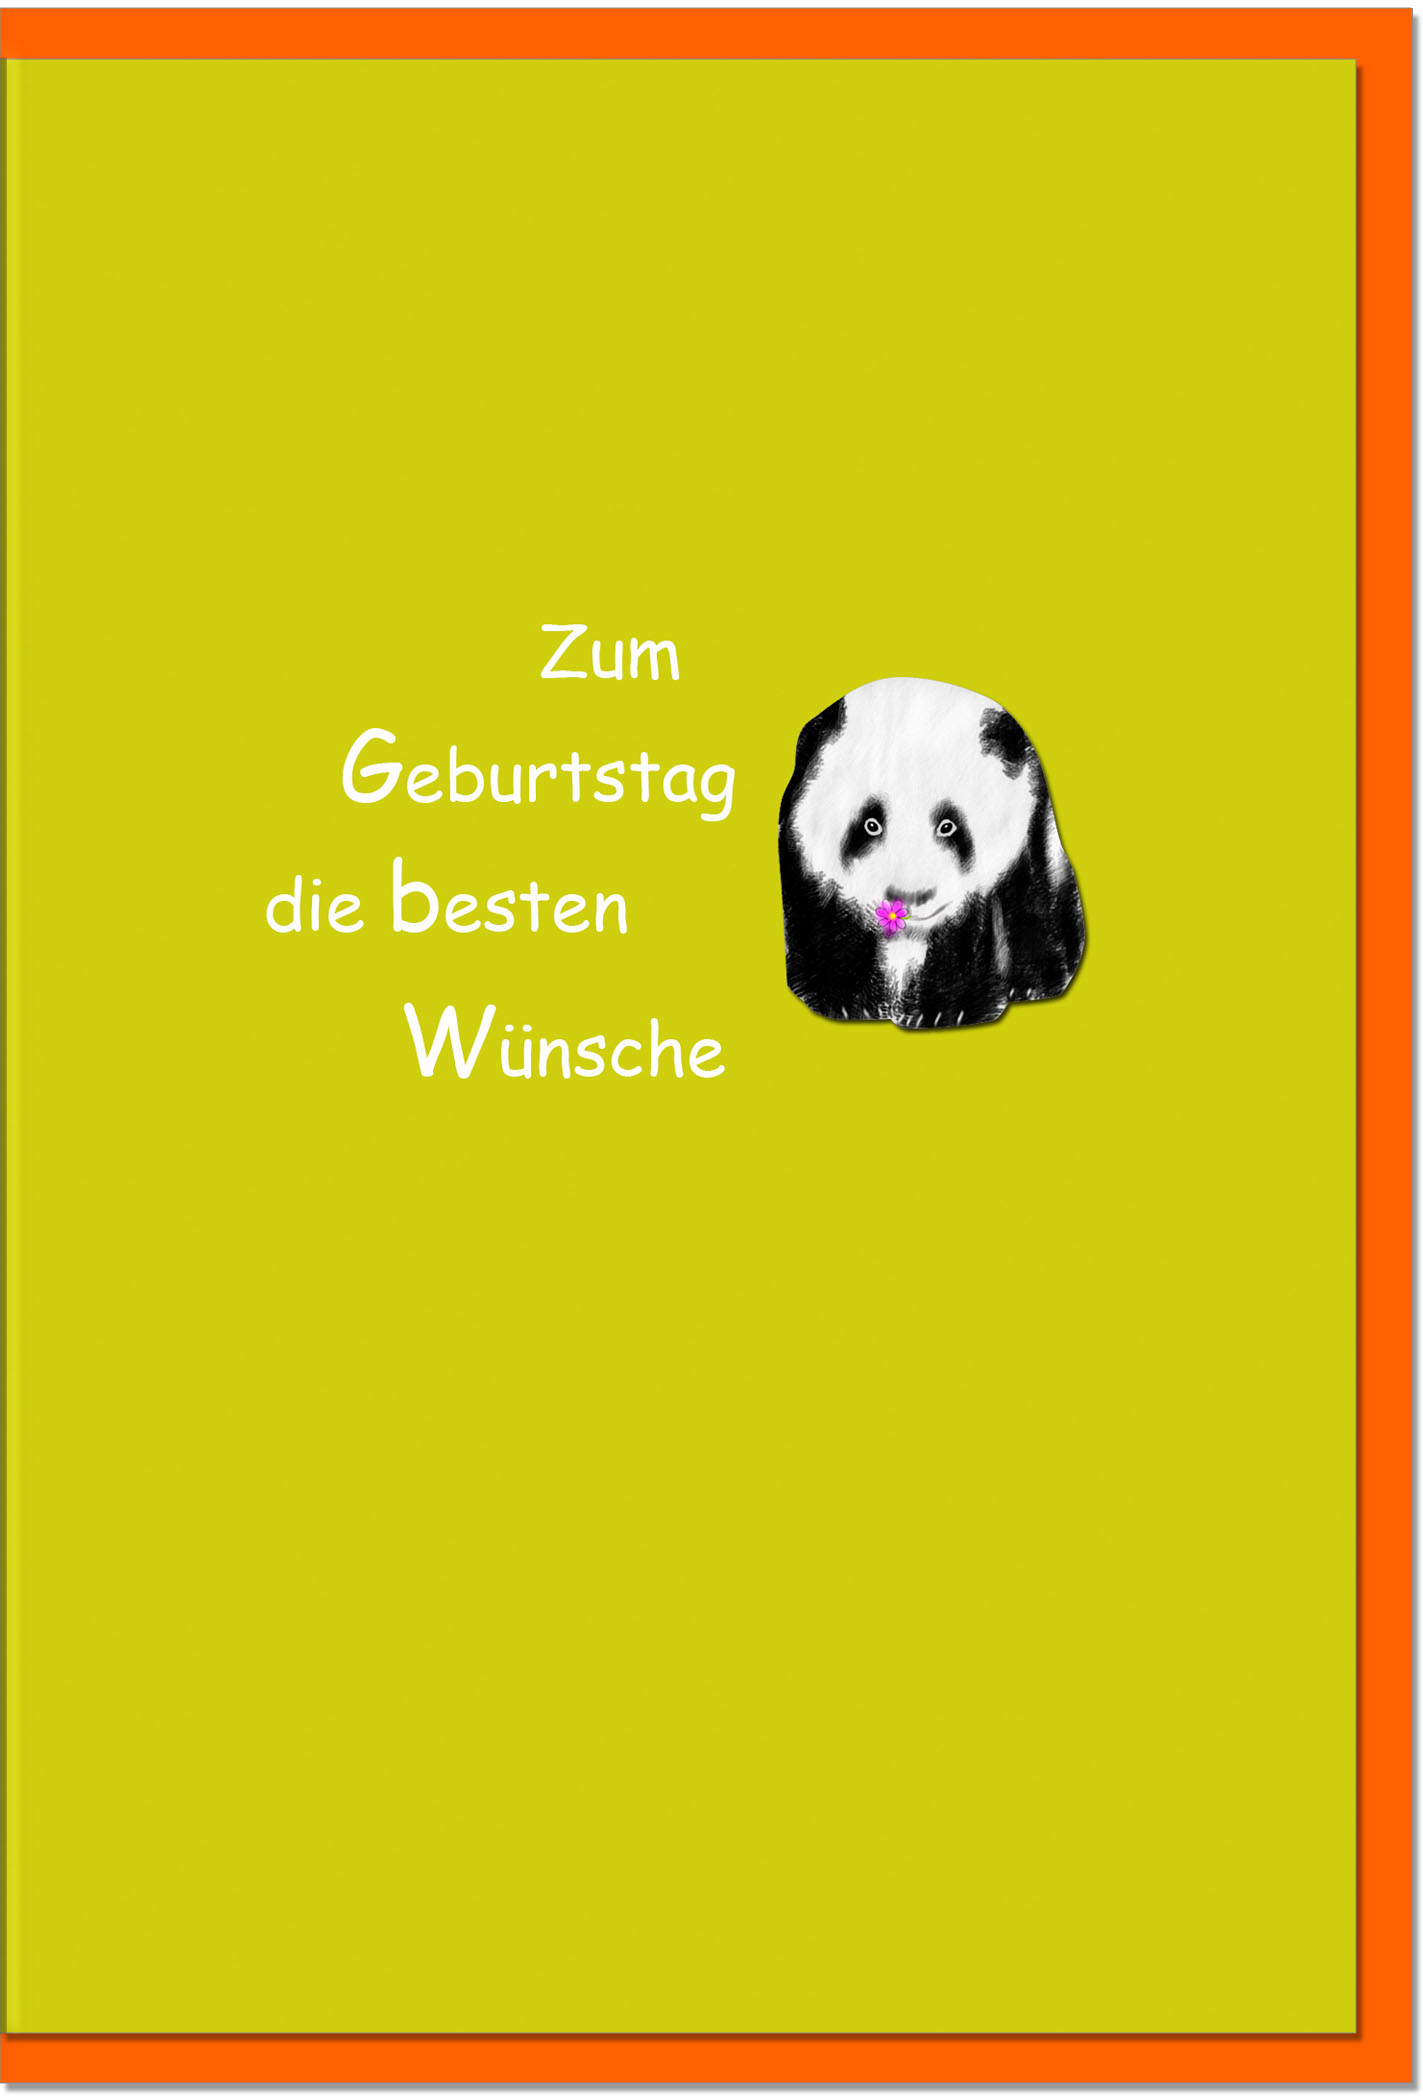 Geburtstagskarten / Grußkarten /Geburtstag Pandabär